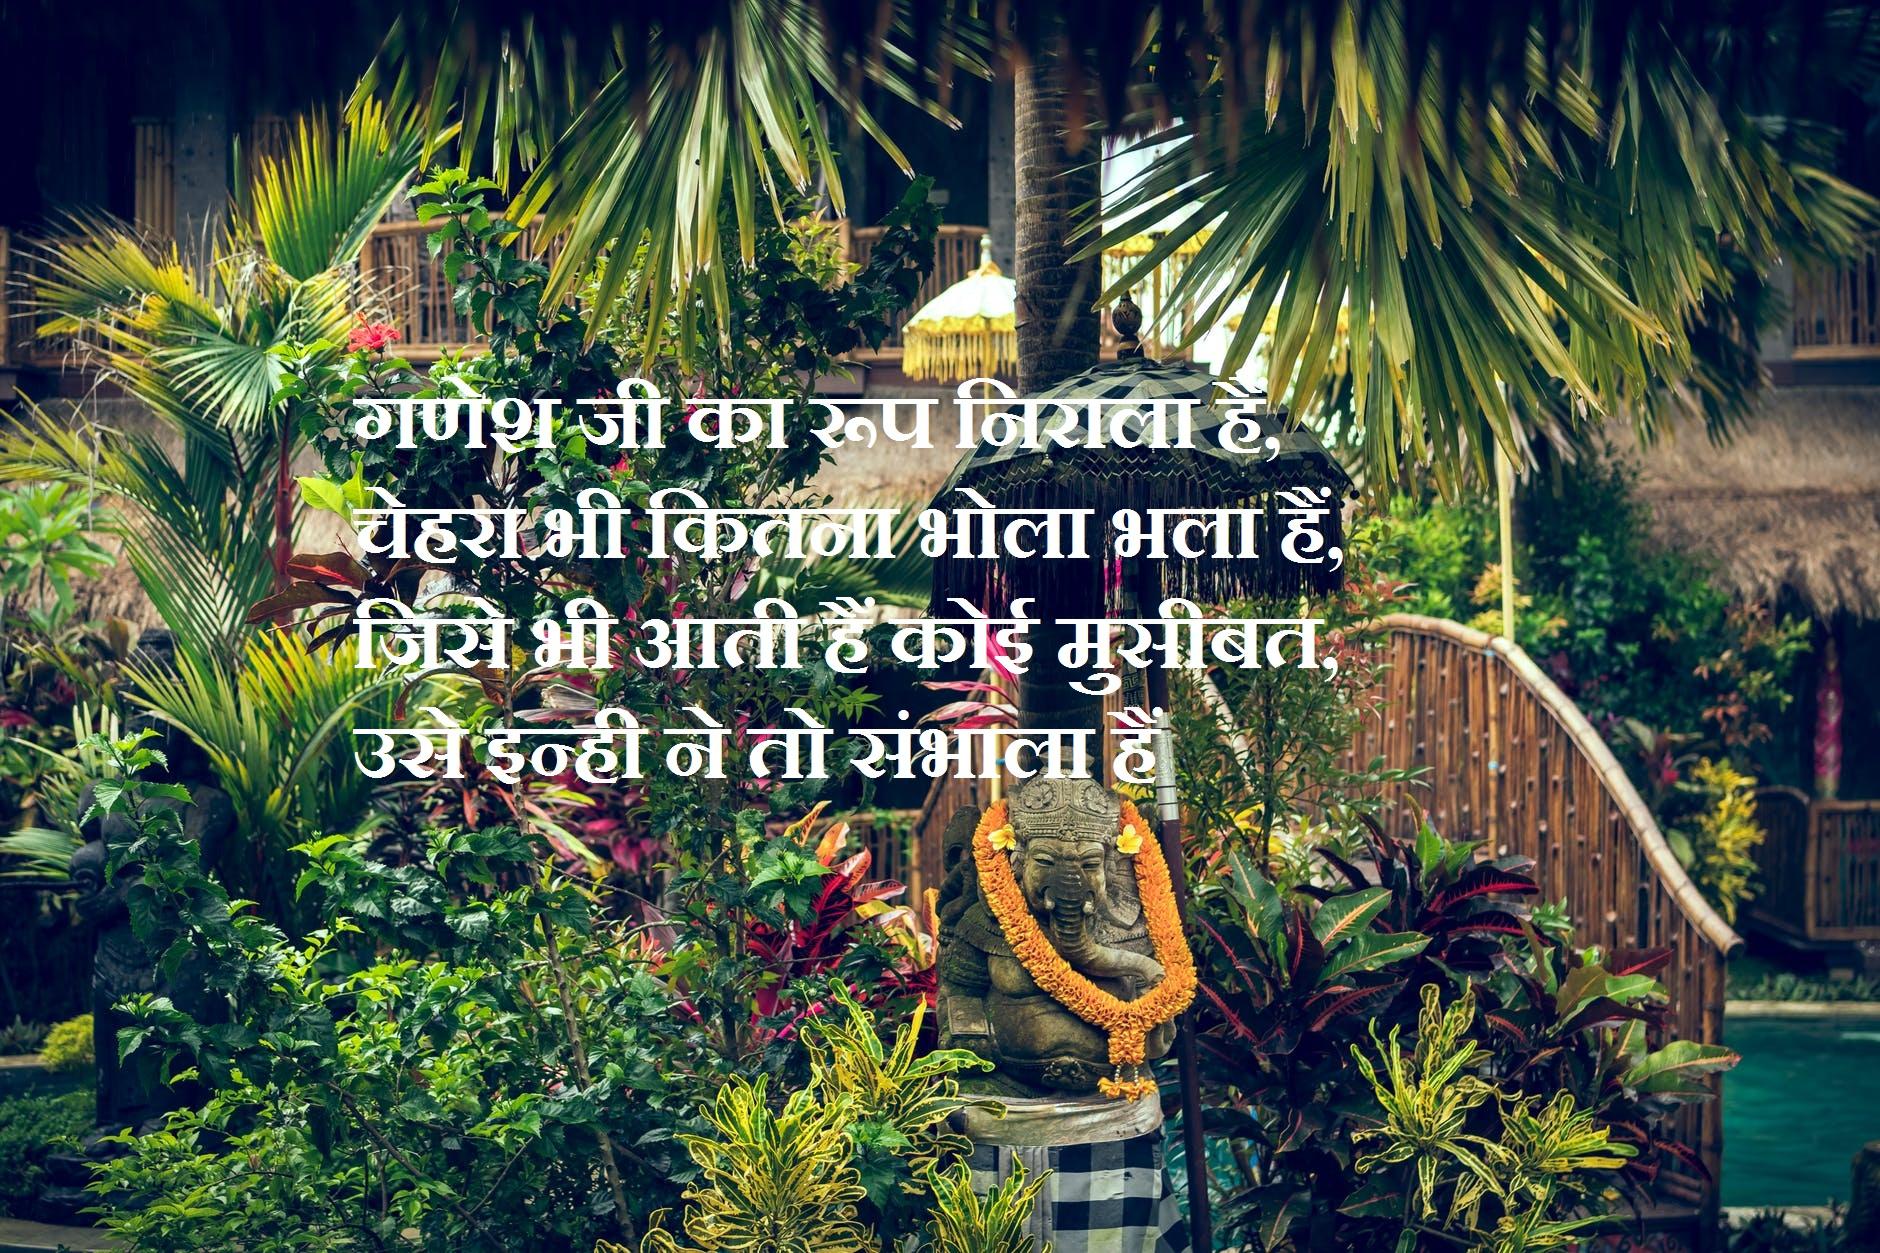 Ganpati Bappa Wishes